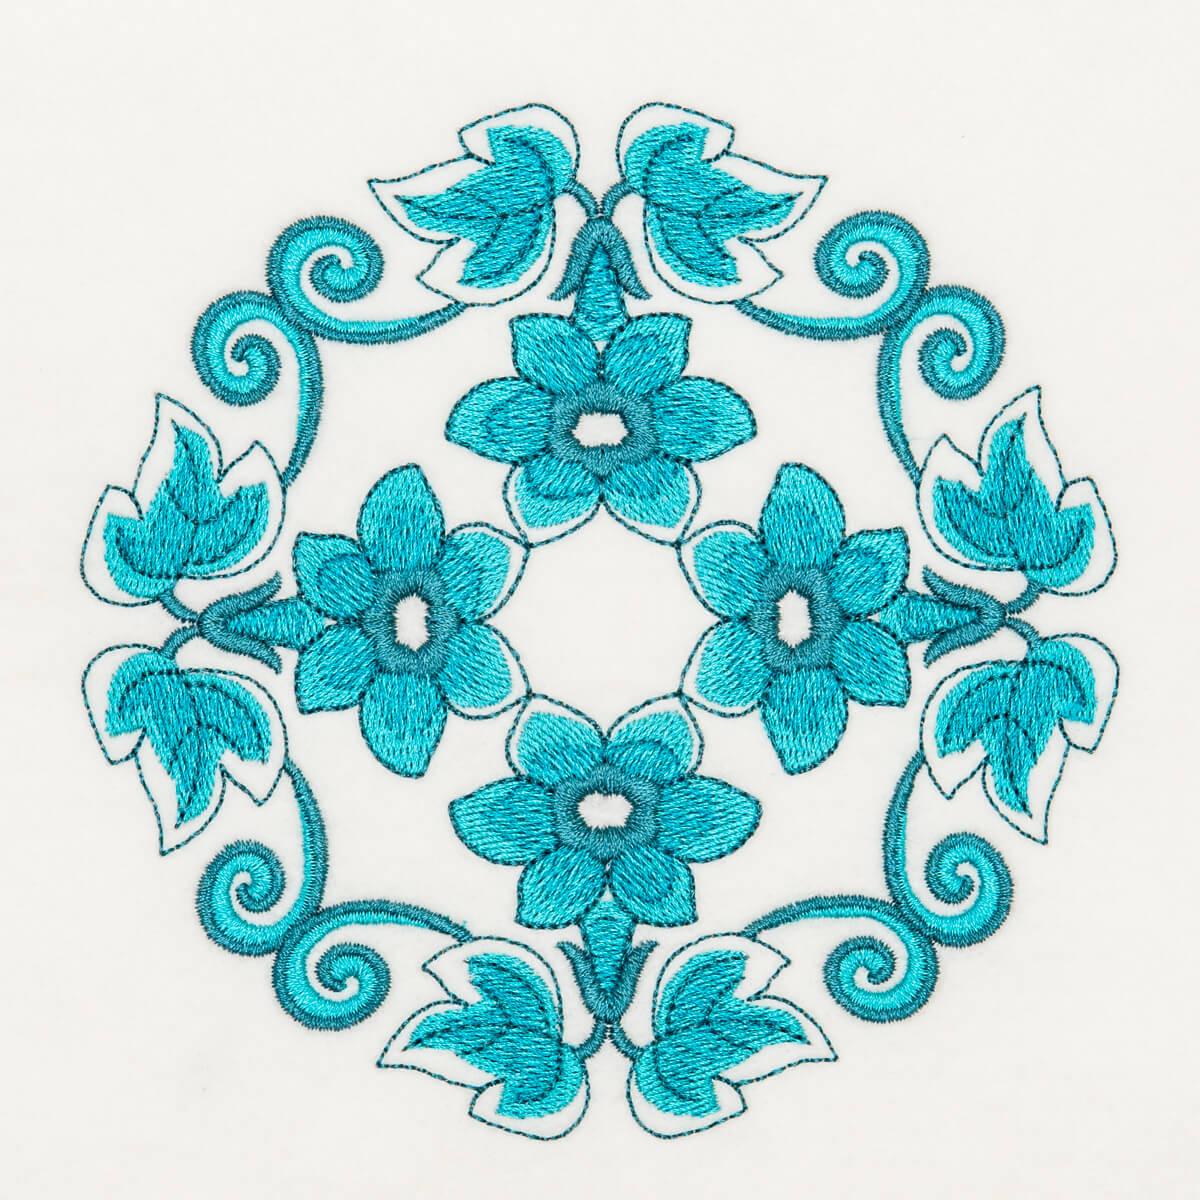 Matriz de bordado floral 549